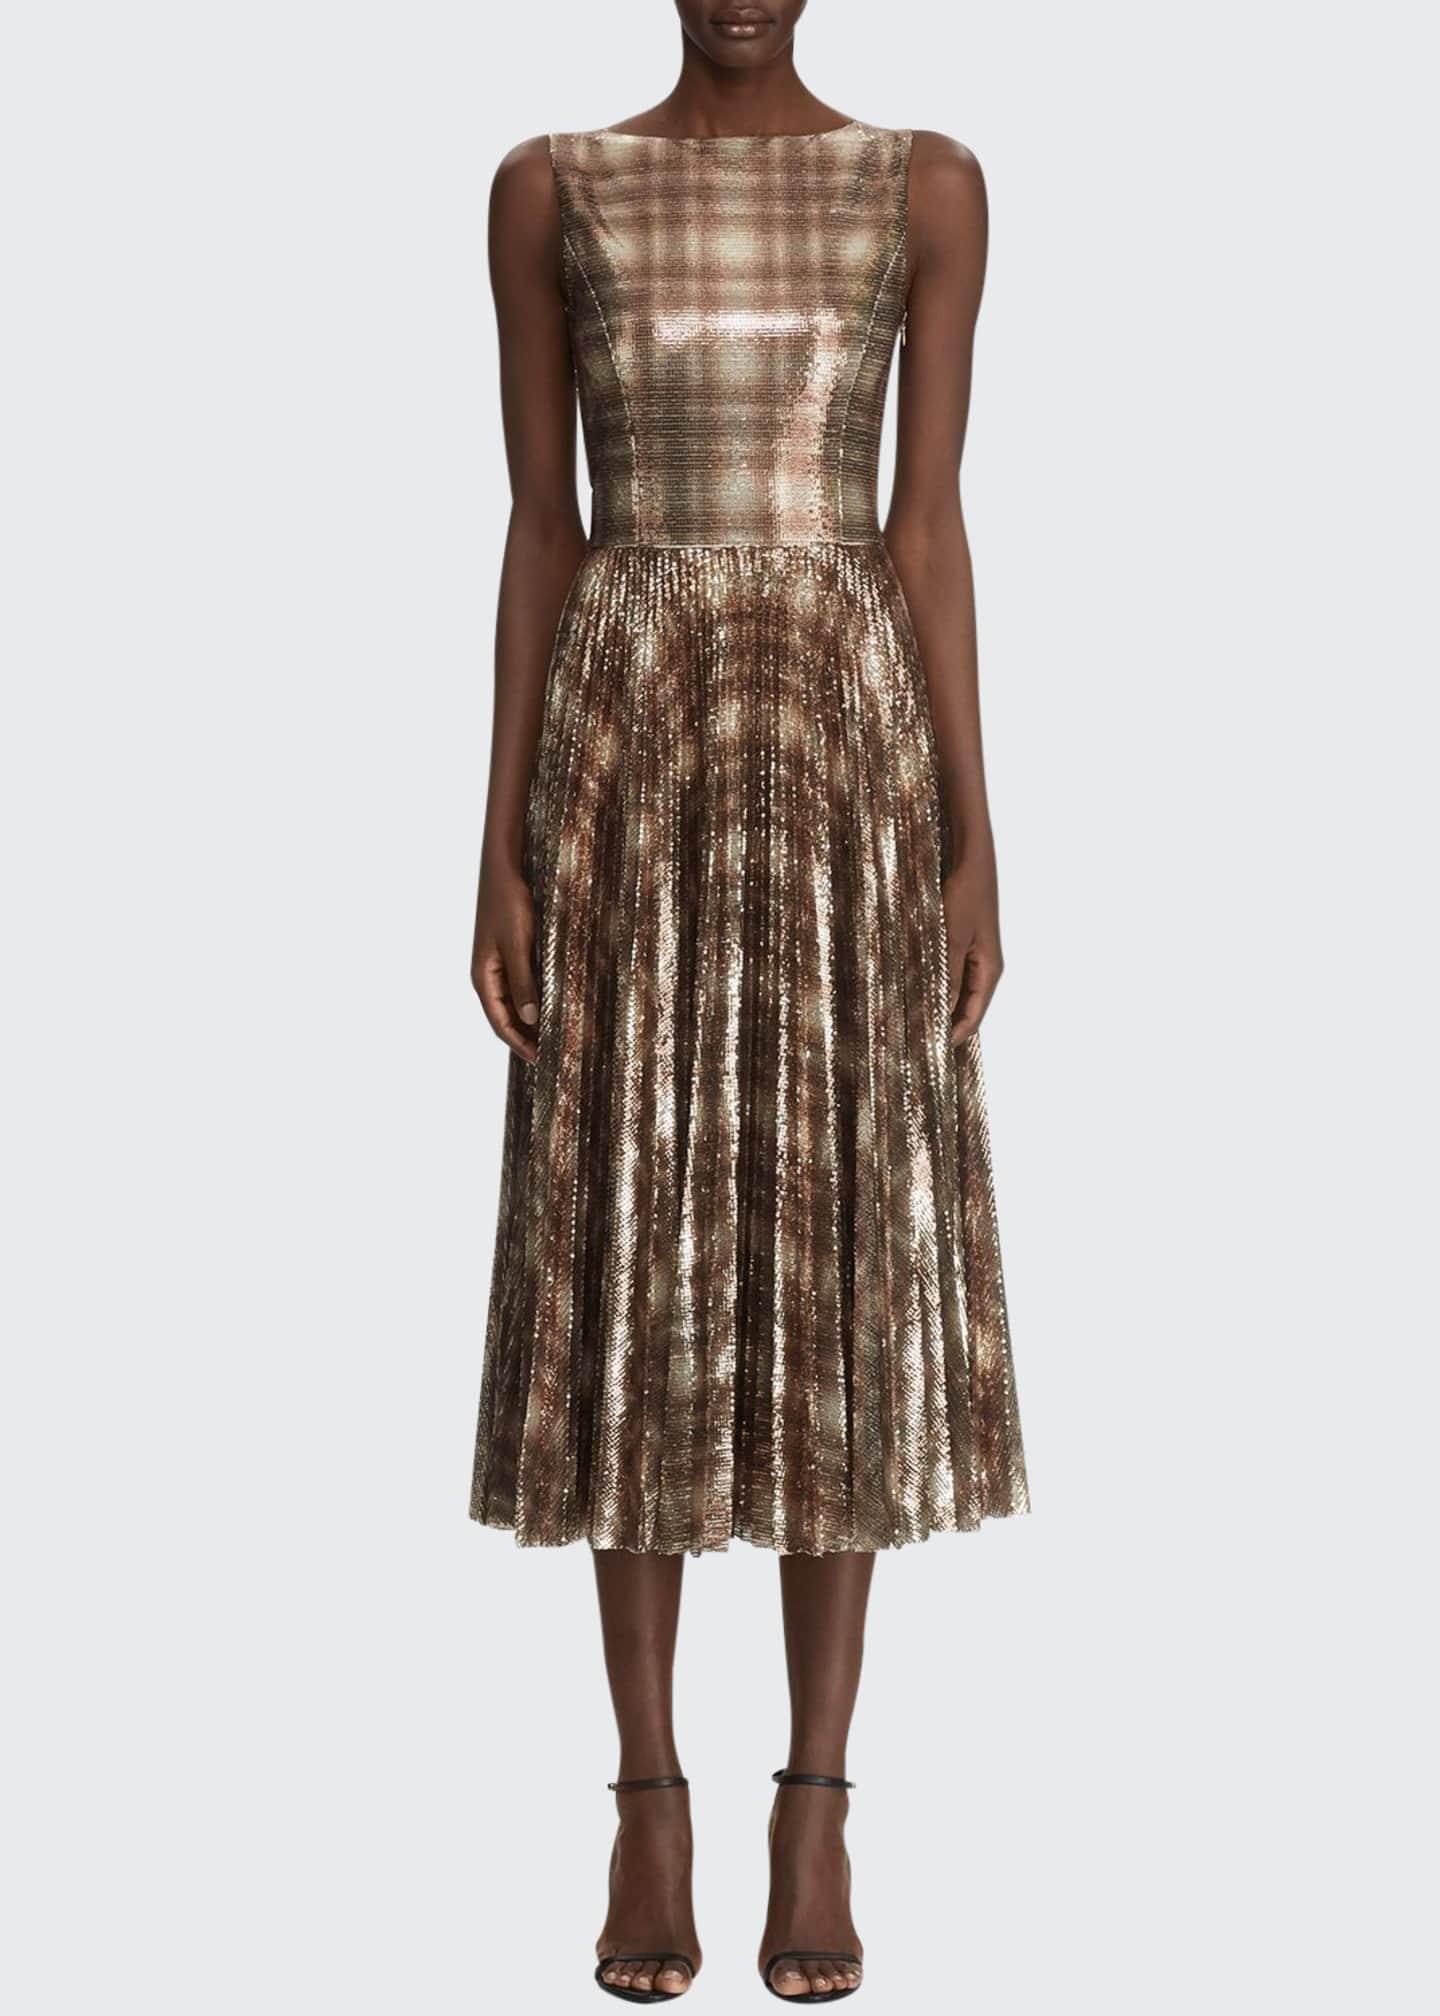 Ralph Lauren Collection Arwen Embellished Plaid Dress